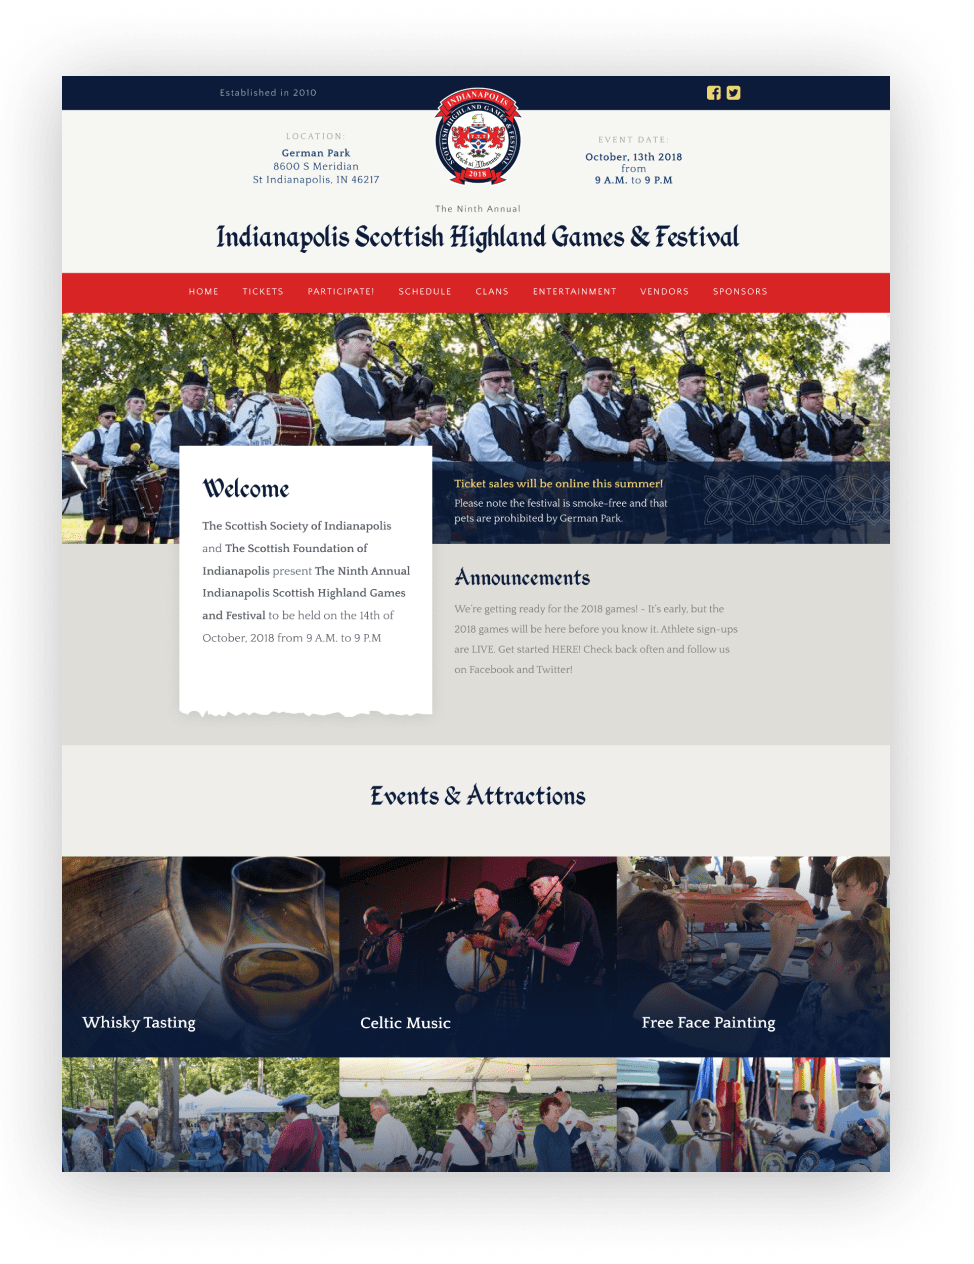 Indianapolis Scottish Highland Games & Festival Website Design